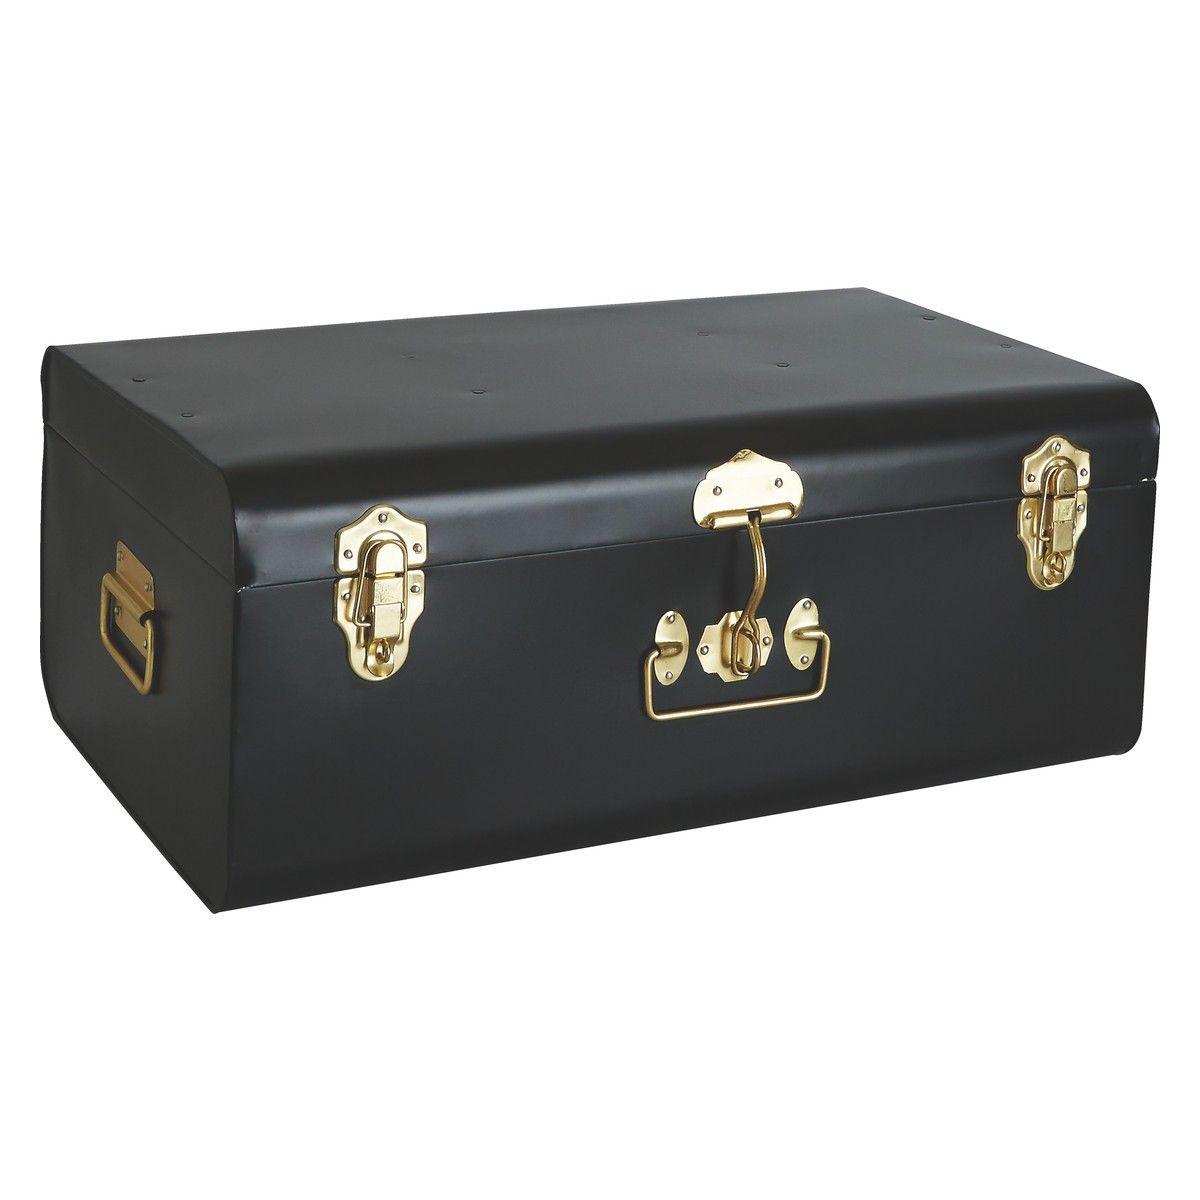 TRUNK Black metal storage trunk | Buy now at Habitat UK  sc 1 st  Pinterest & TRUNK Black large metal storage trunk with gold clasps | Pinterest ...